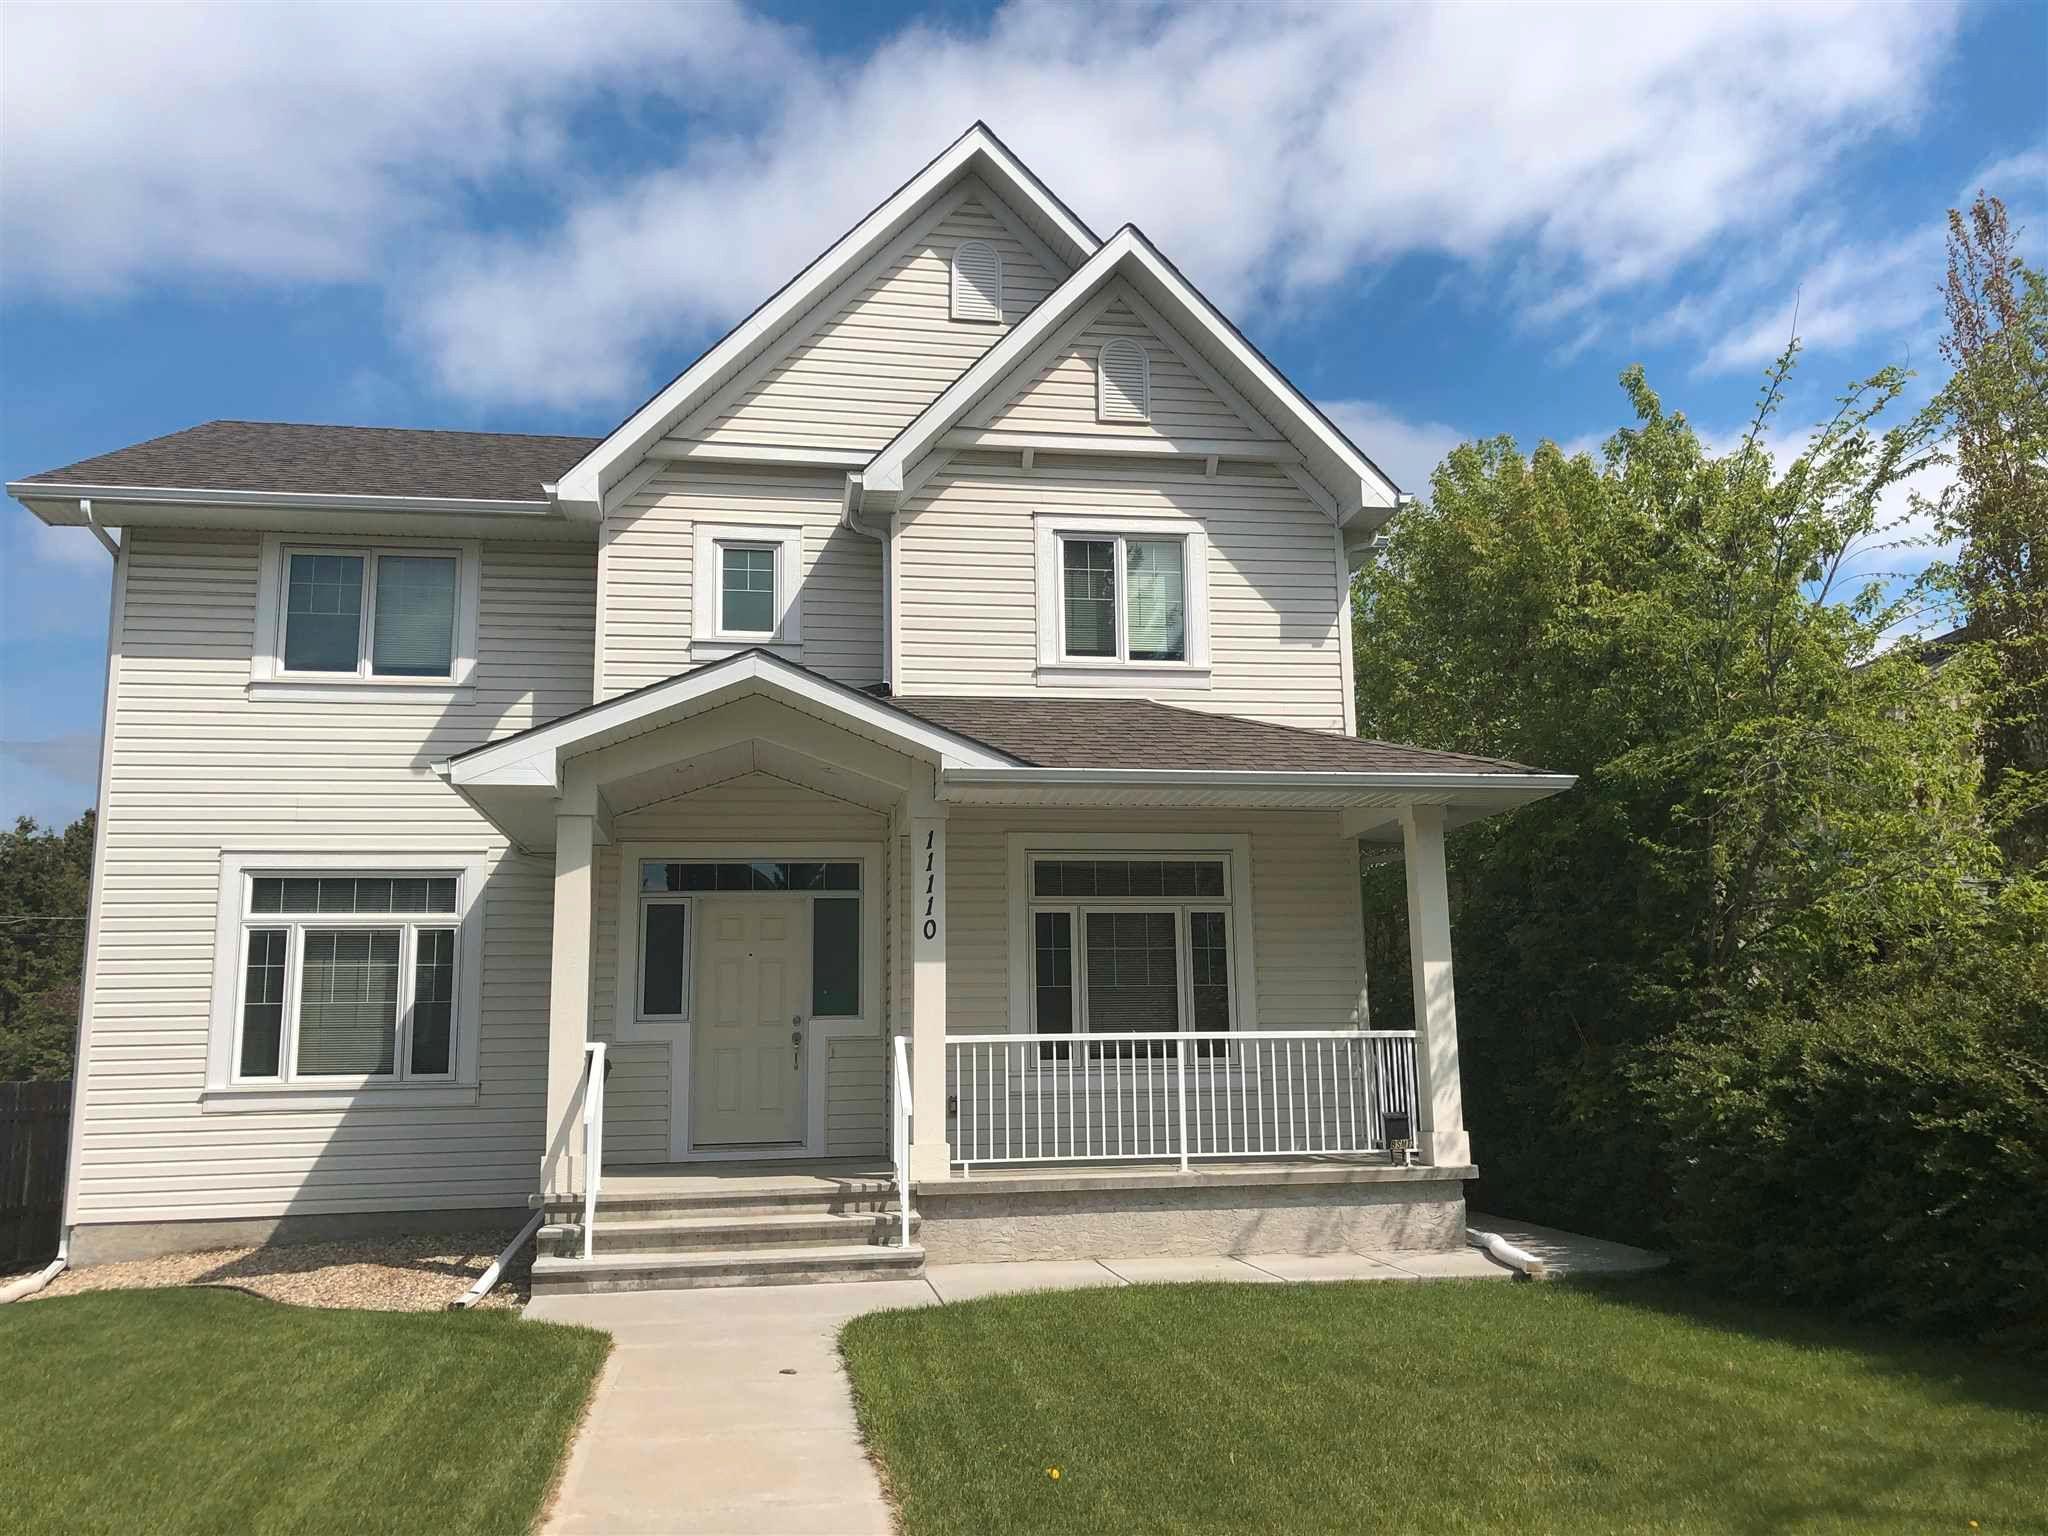 Main Photo: 11110 72 Avenue in Edmonton: Zone 15 House for sale : MLS®# E4246373